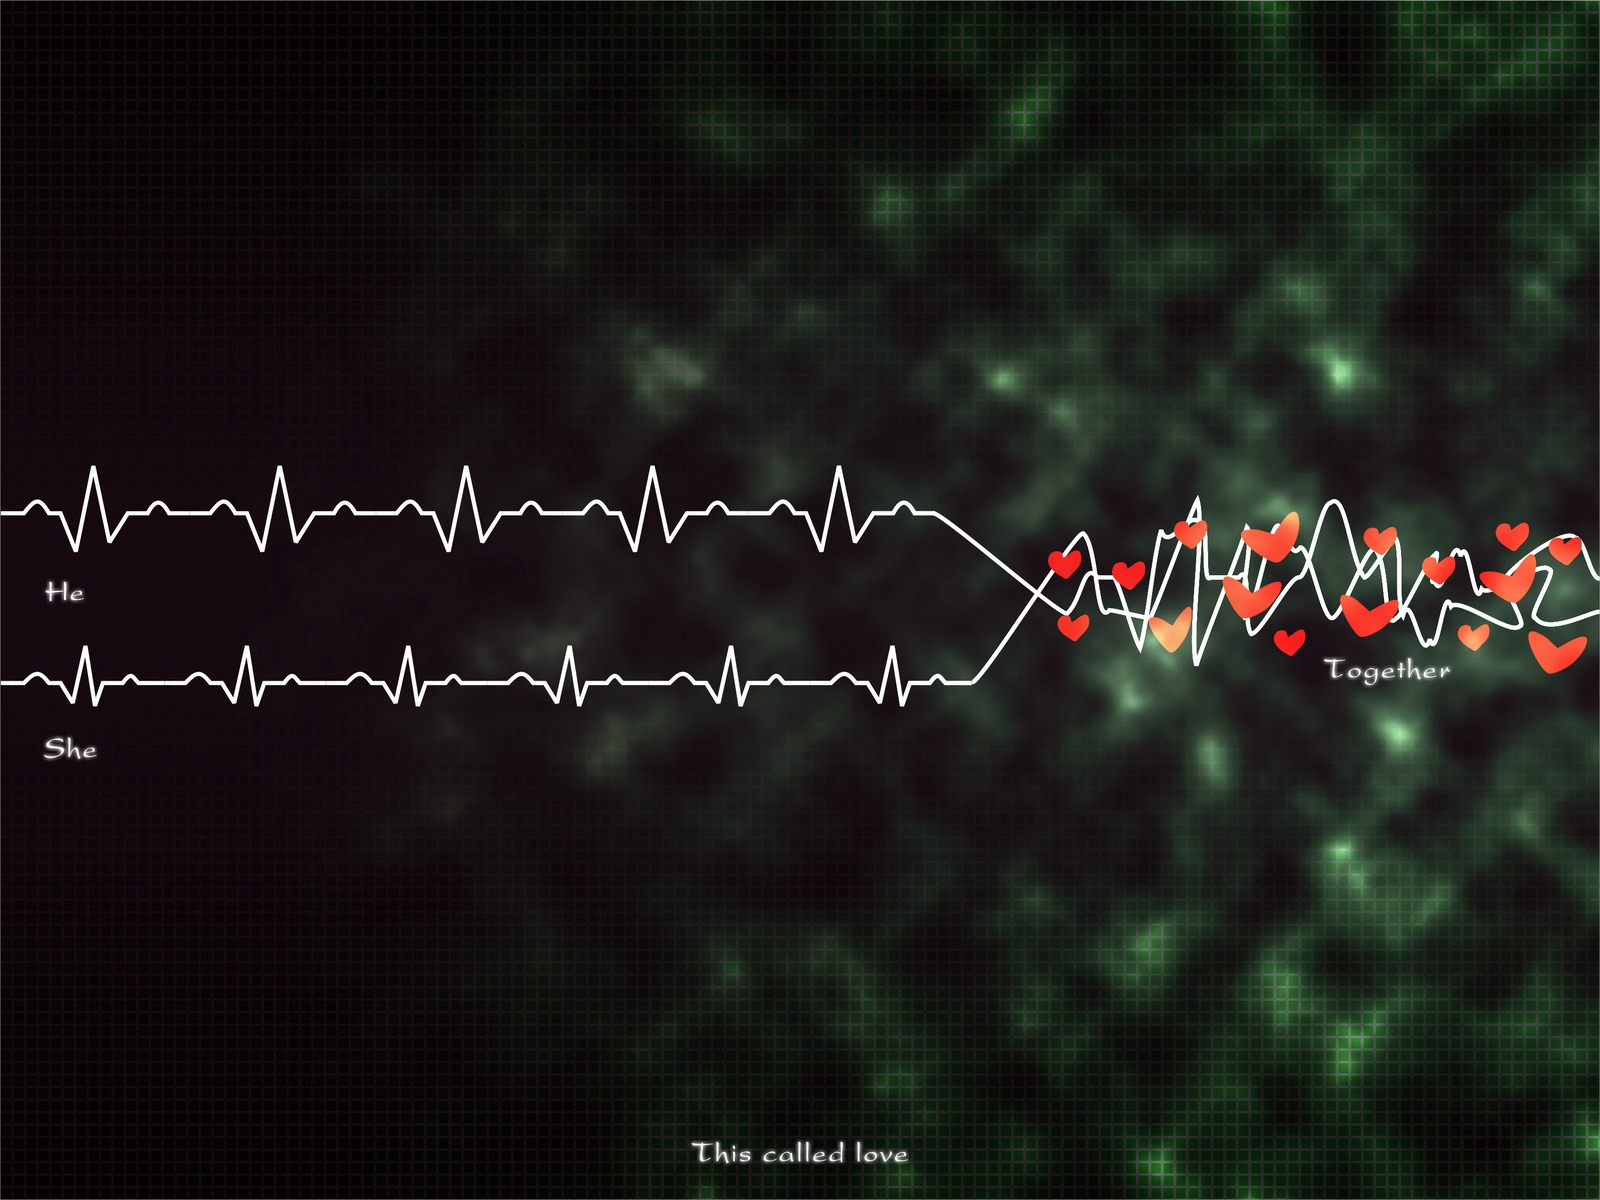 wallpaper, rhythm, heart, plexus wallpaper, background